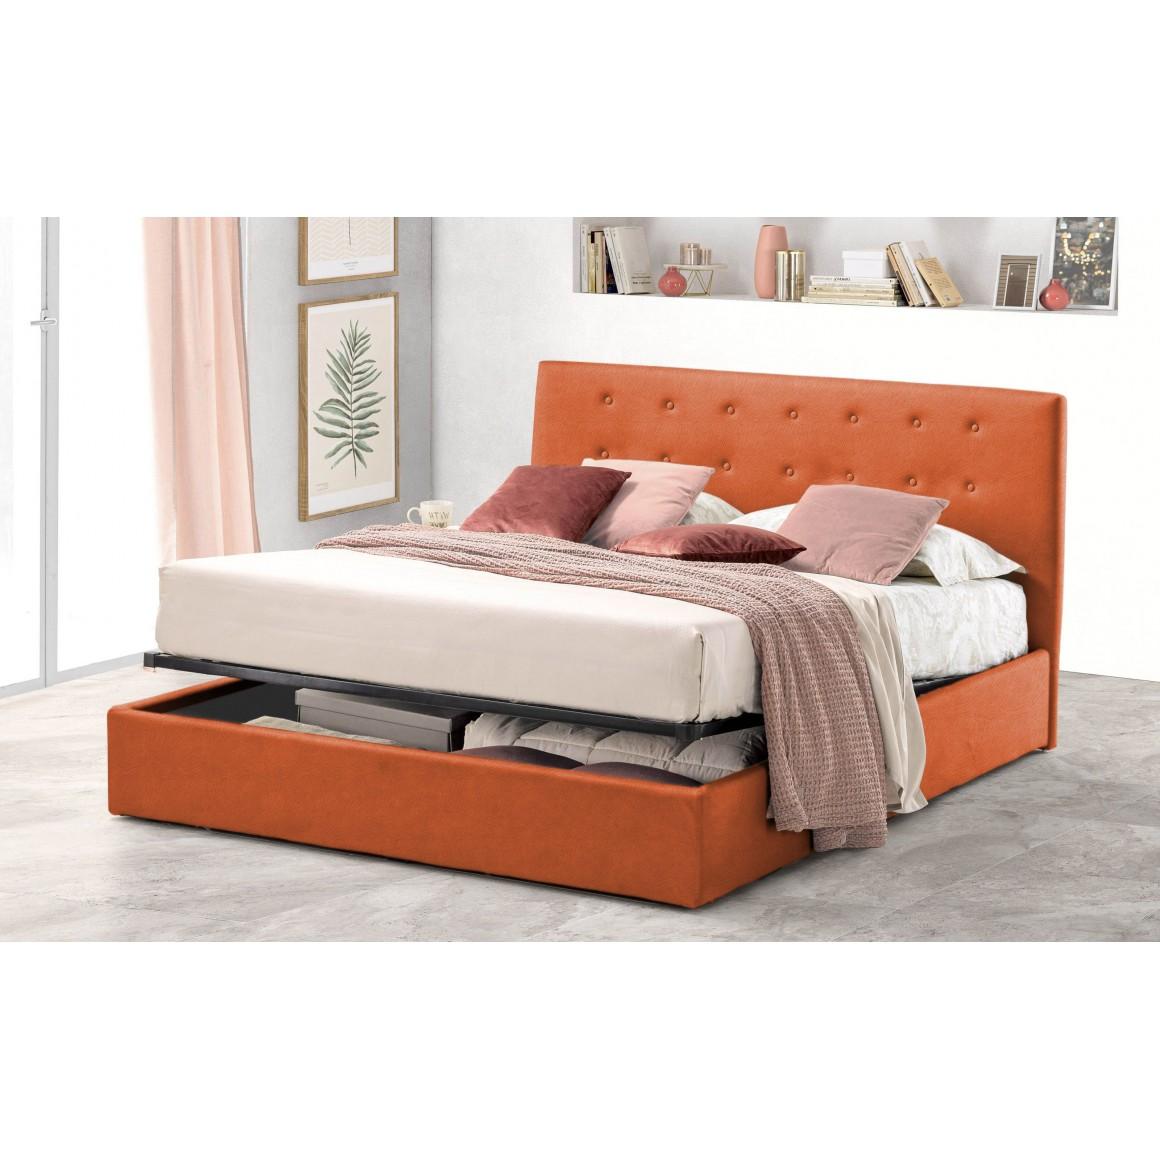 Pat Tapitat pentru Dormitor cu Lada, 100x200, Abra Promo Dolce Dormire, Textil Teflonat, Anti-Pete Jungle, Portocaliu